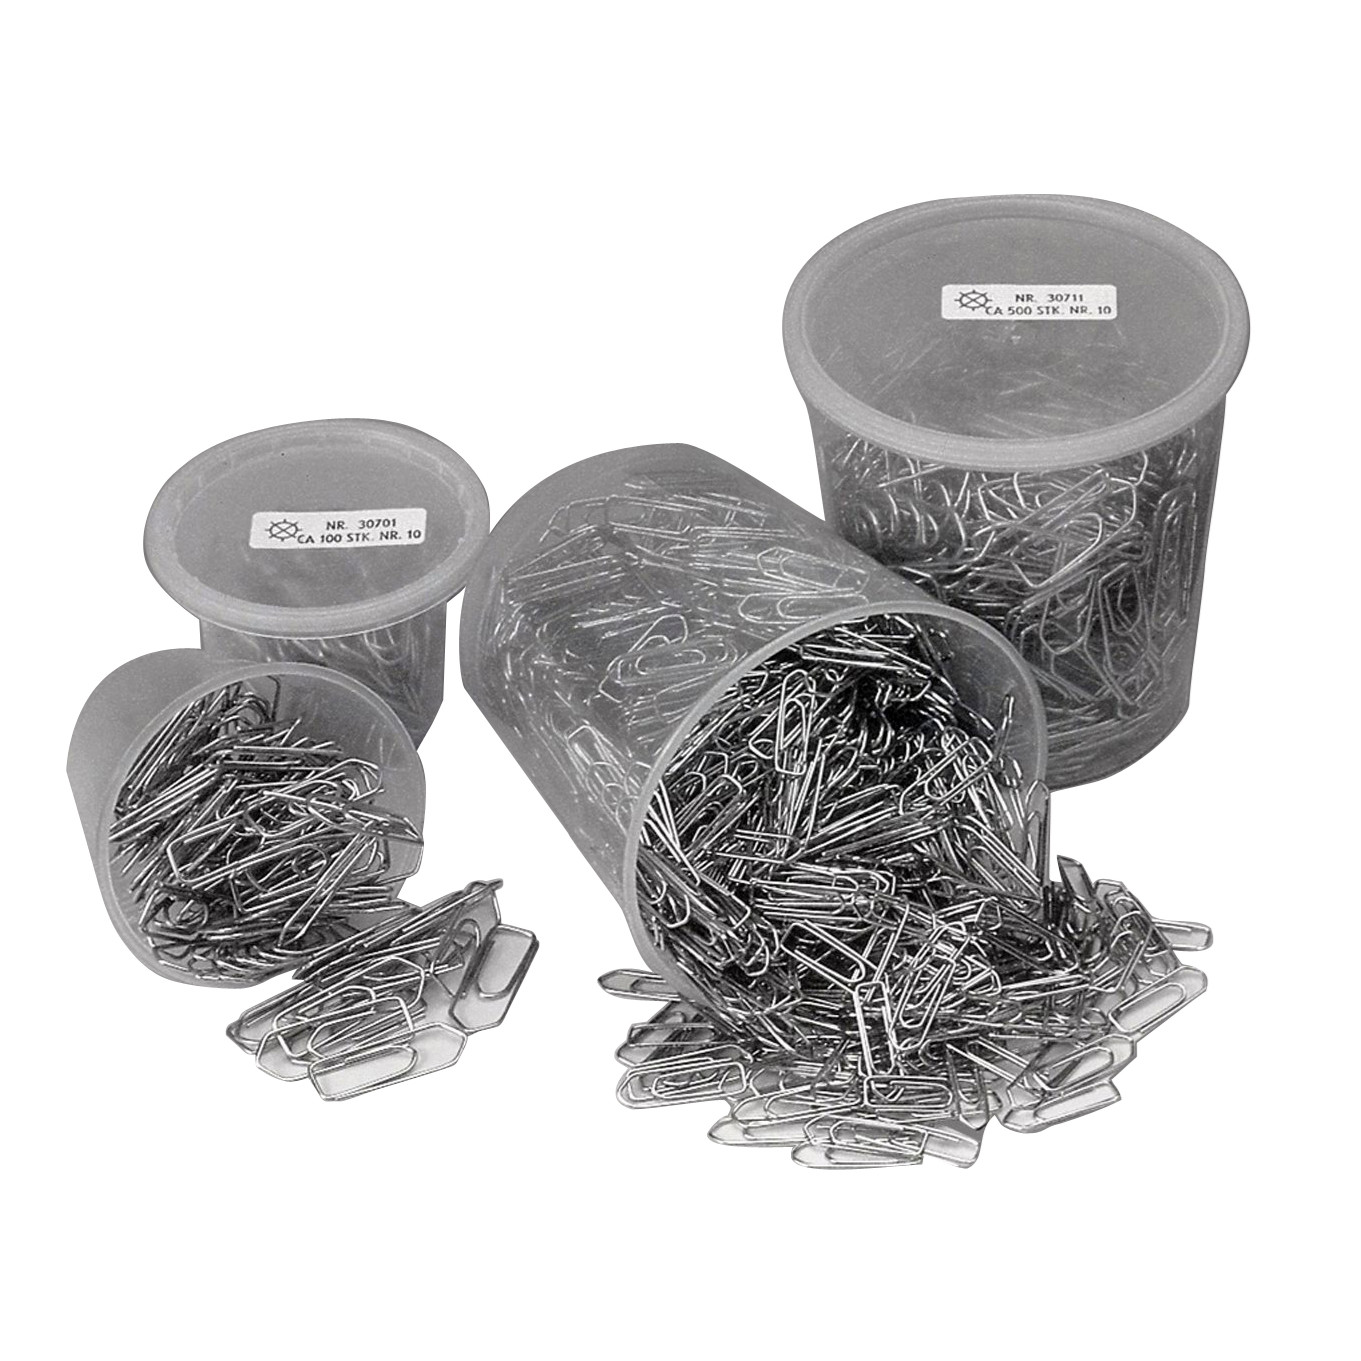 Clips Esselte 25mm i plastdåse 1000stk/ds 30710